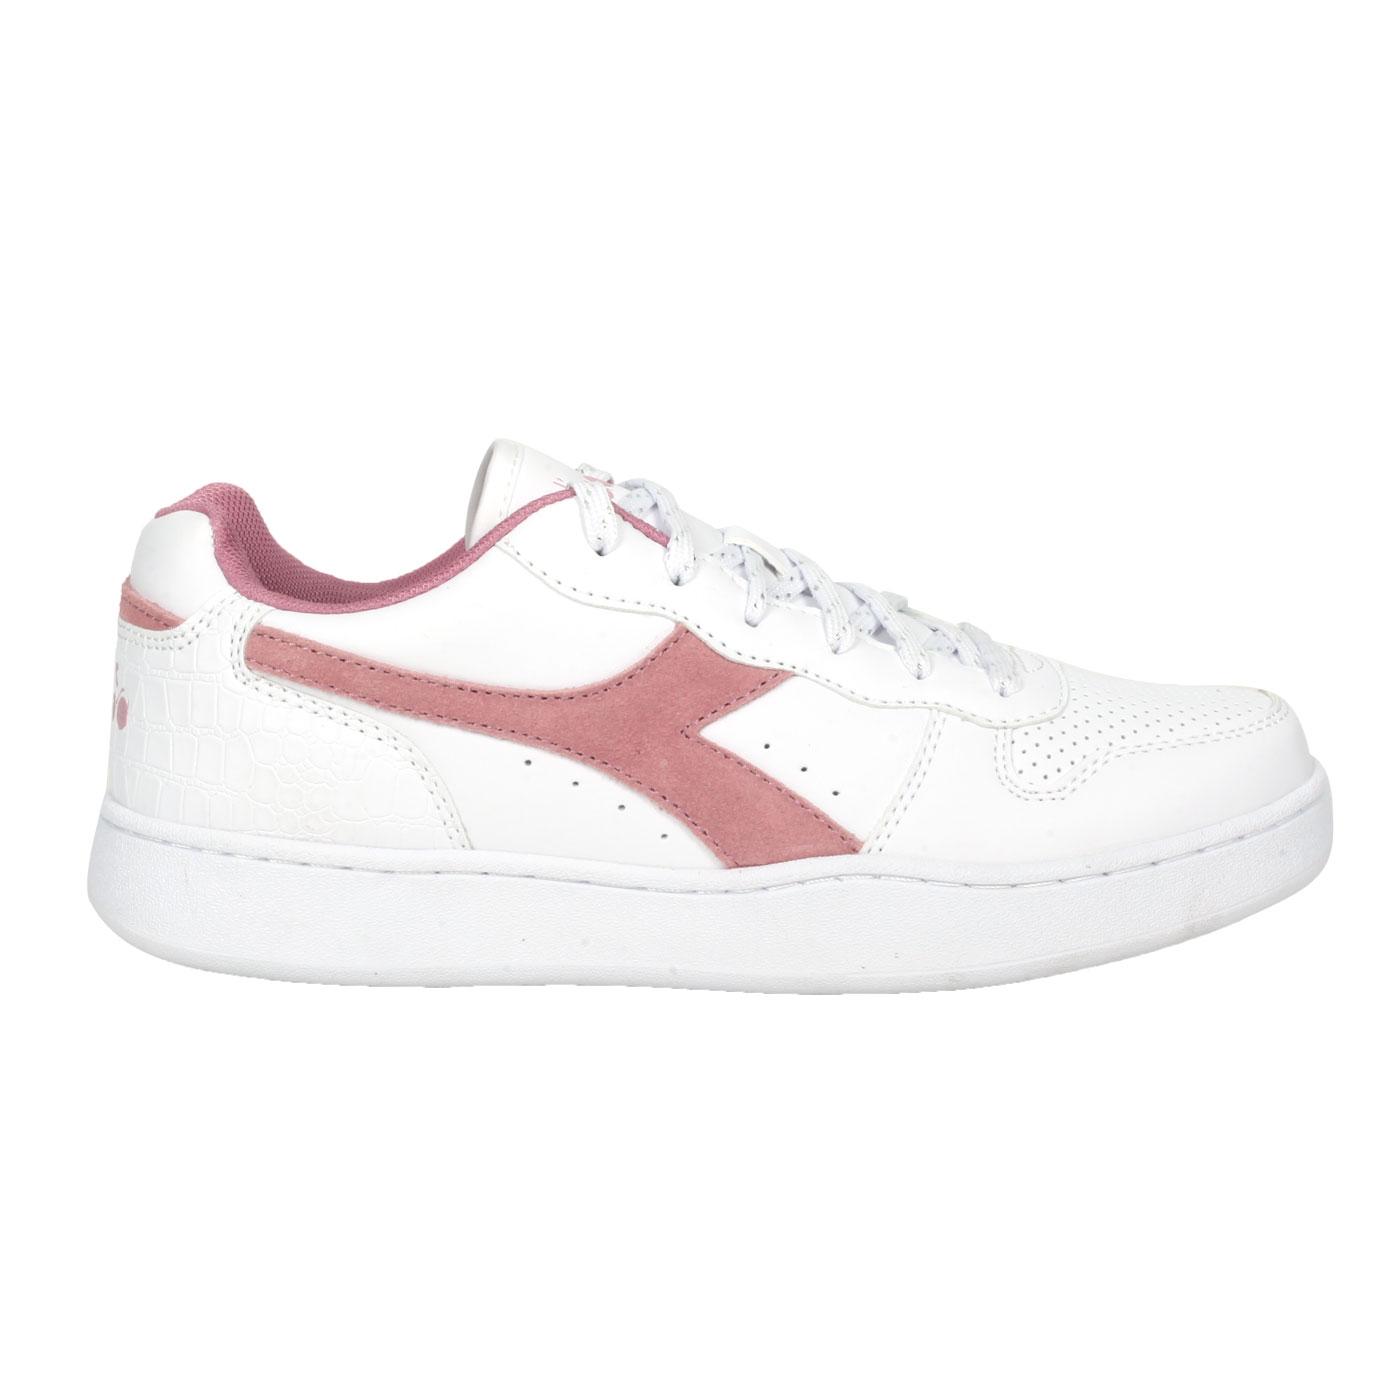 DIADORA 女款進口復古網球鞋 DA176999-C9017 - 白紫紅